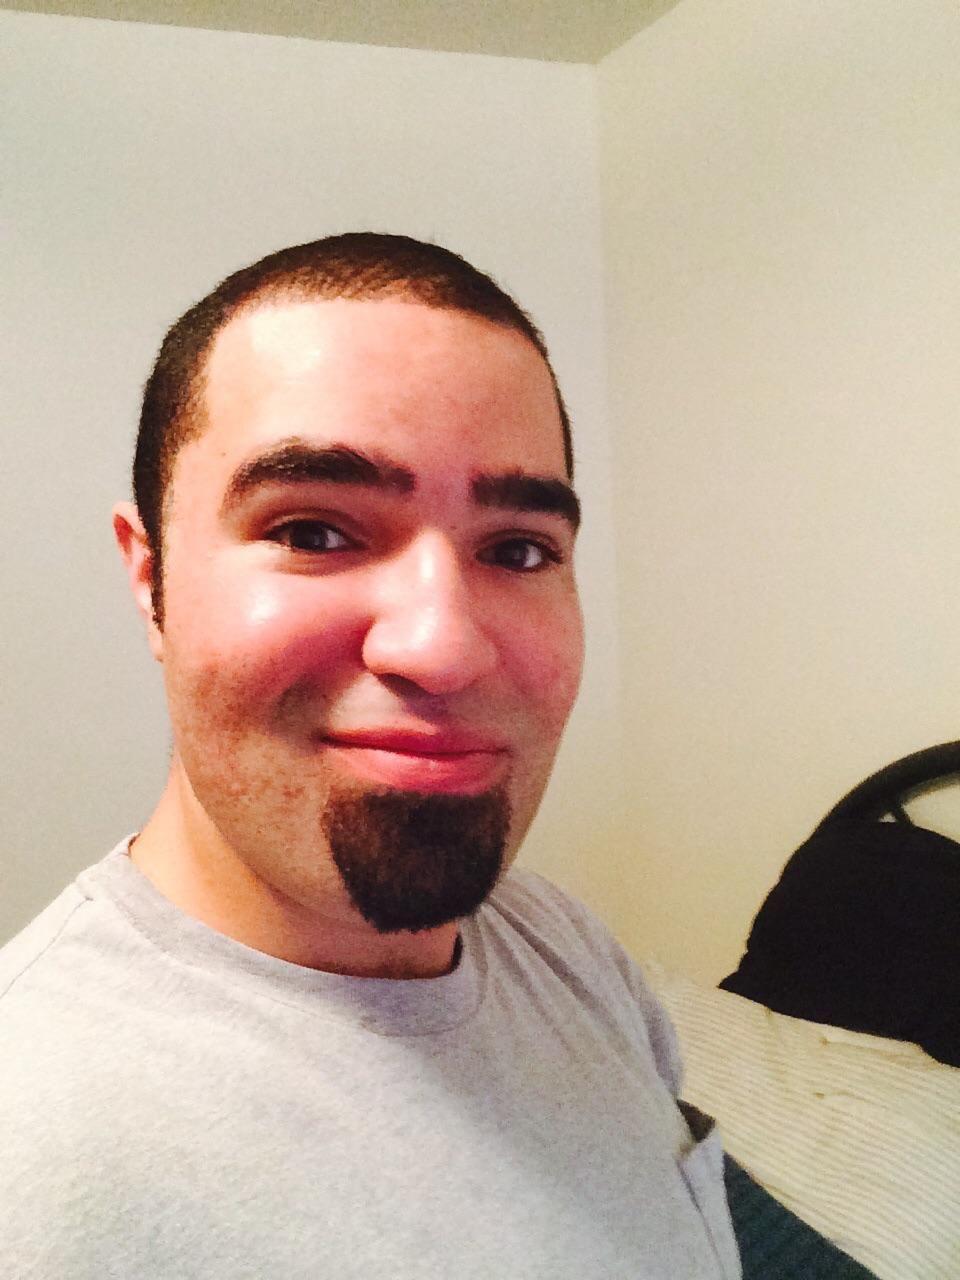 Anthony LeBlanc, owner of LeBlanc IT Services